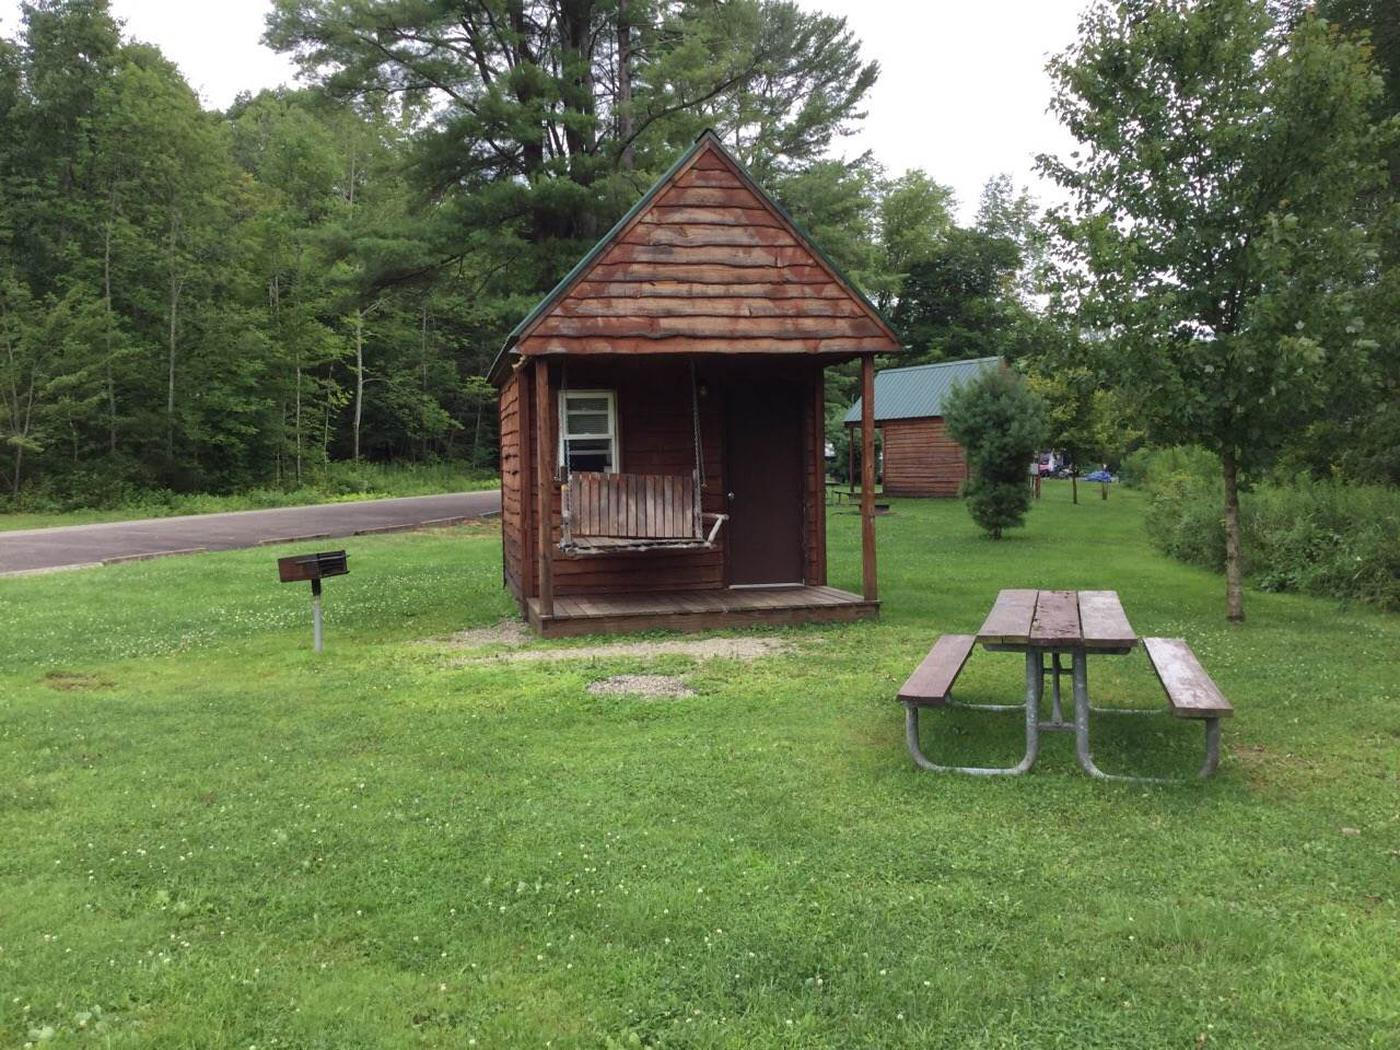 Willow Bay Recreation Area: Campsite 31